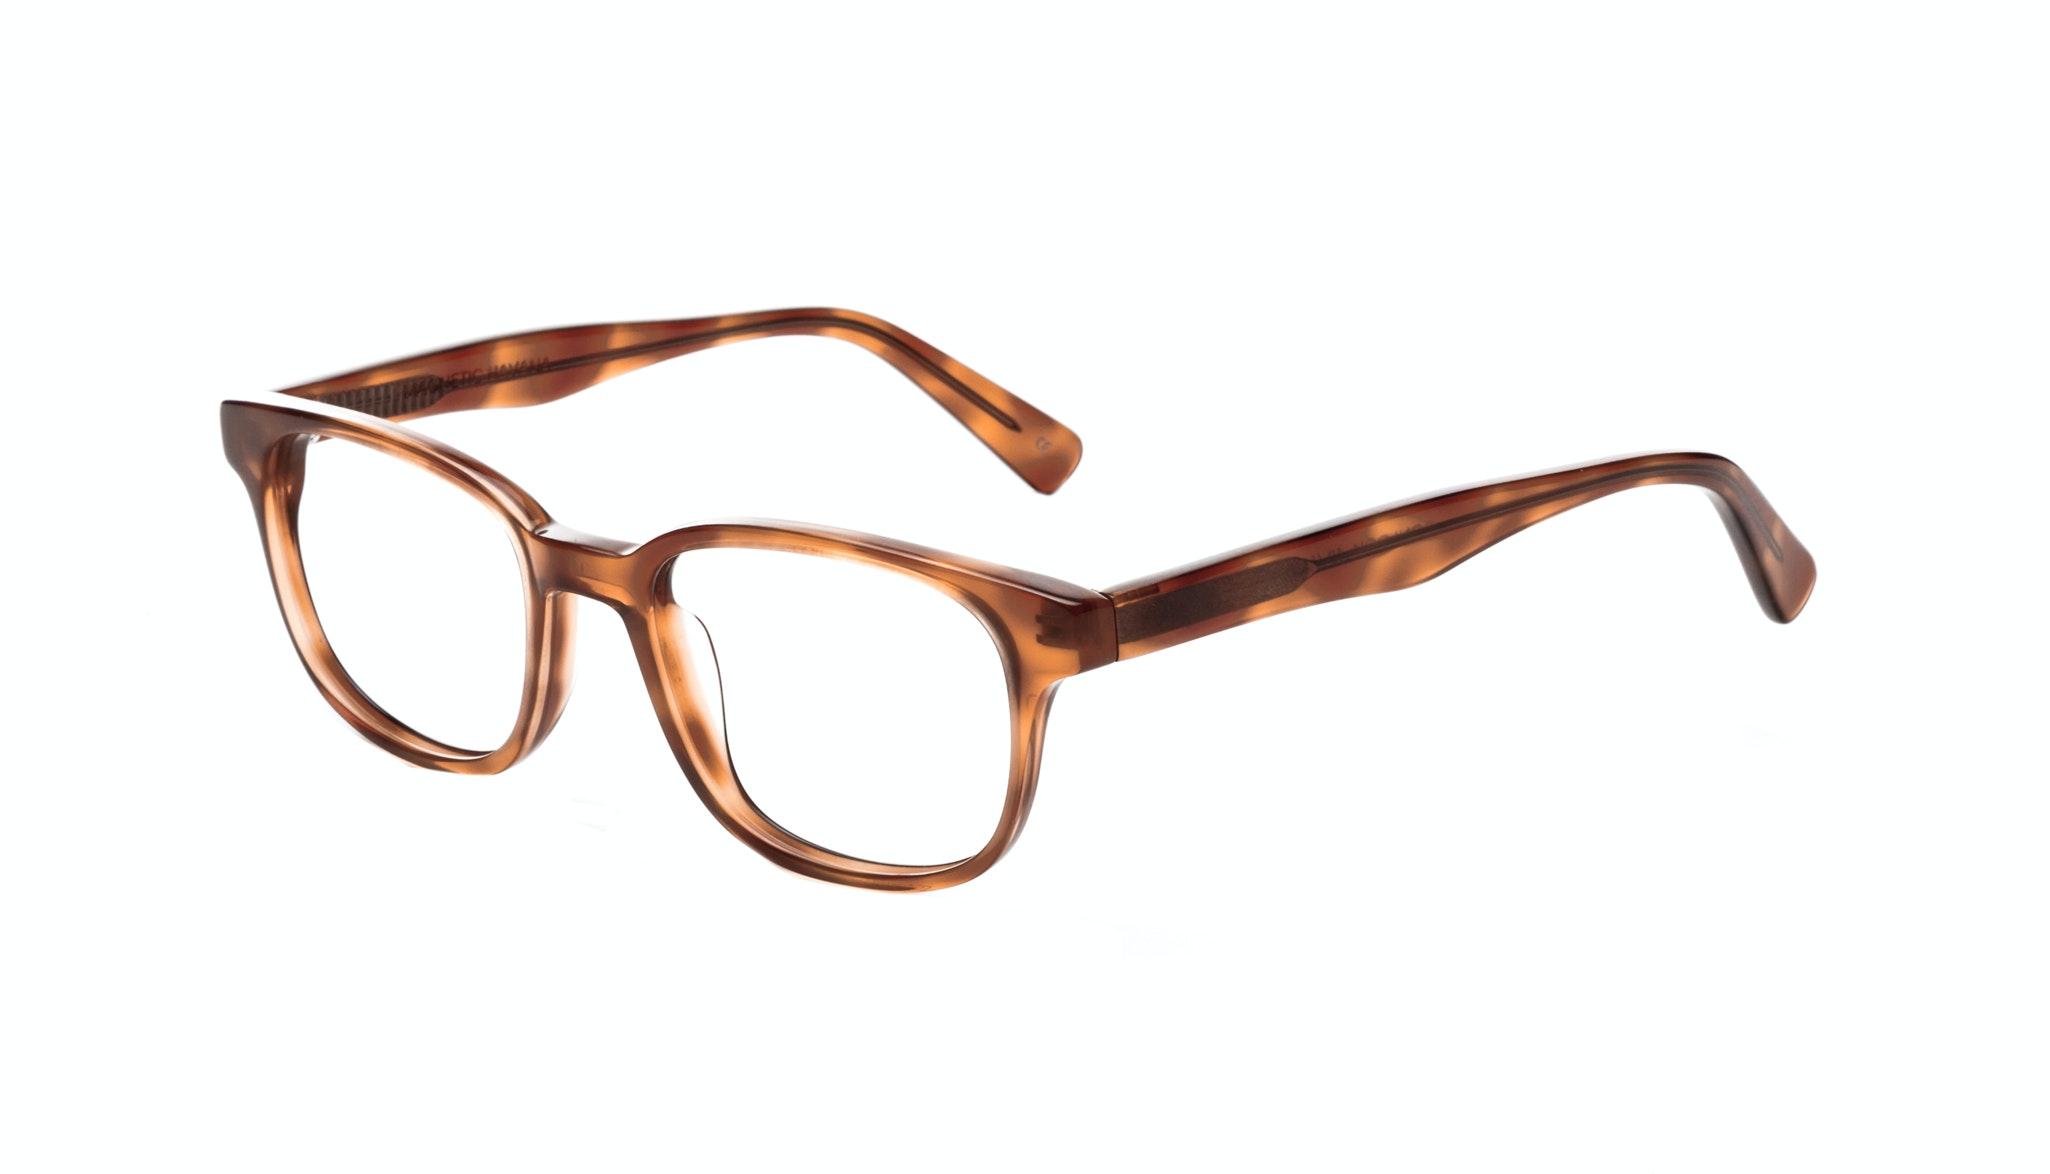 Affordable Fashion Glasses Rectangle Square Eyeglasses Men Women Magnetic Havana Tilt